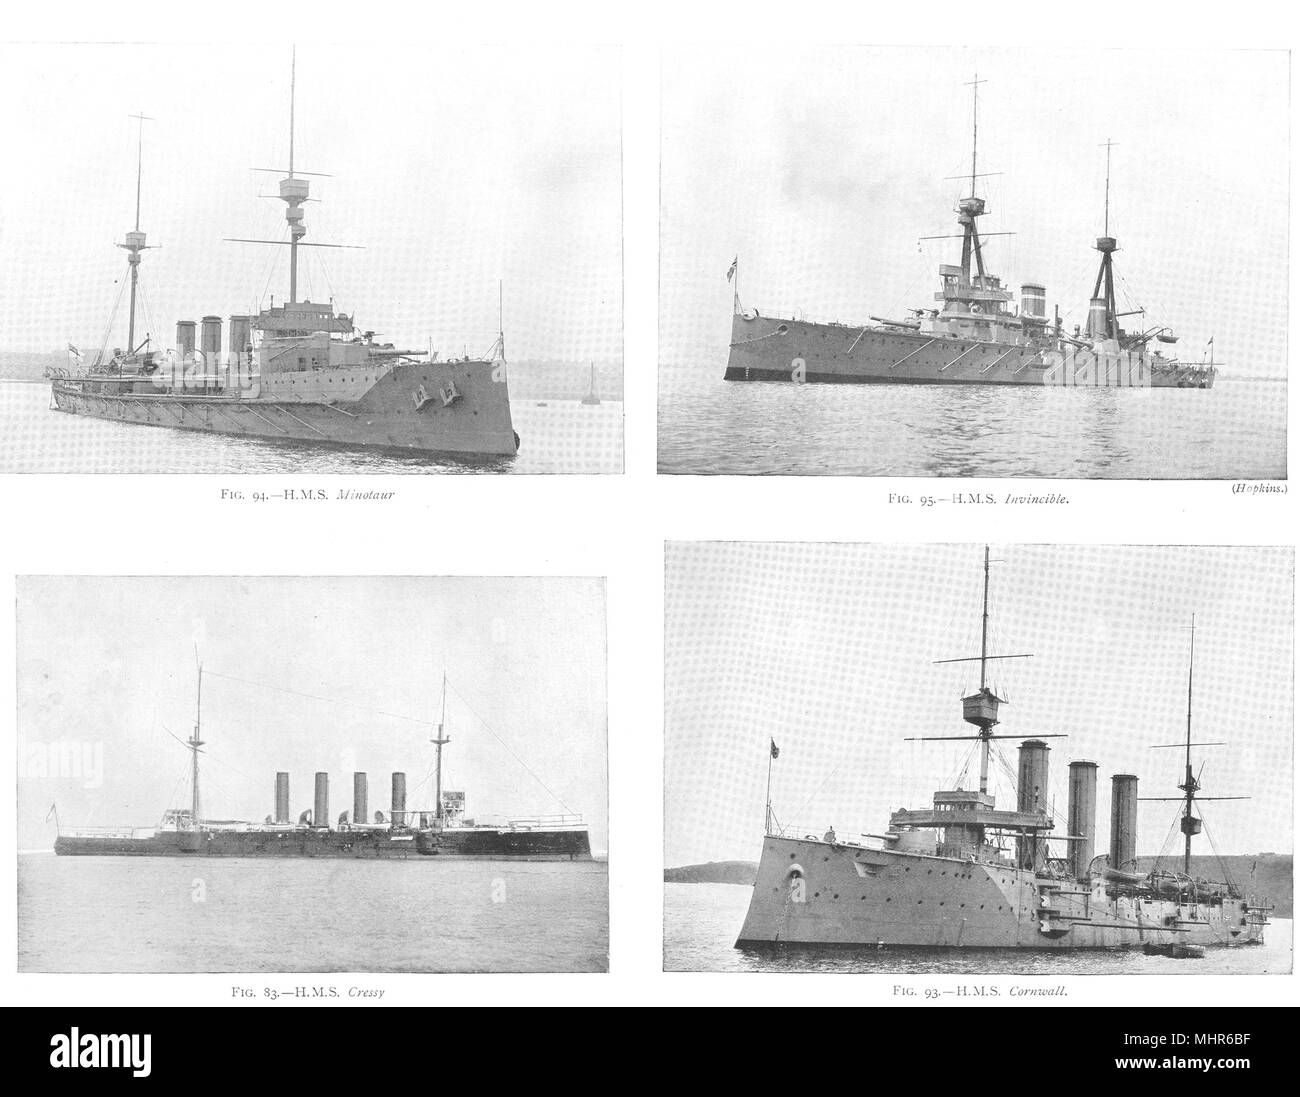 SHIPS. HMS Minotaur; HMS Invincible; HMS Crecy Cressy; HMS Cornwall 1910 print - Stock Image